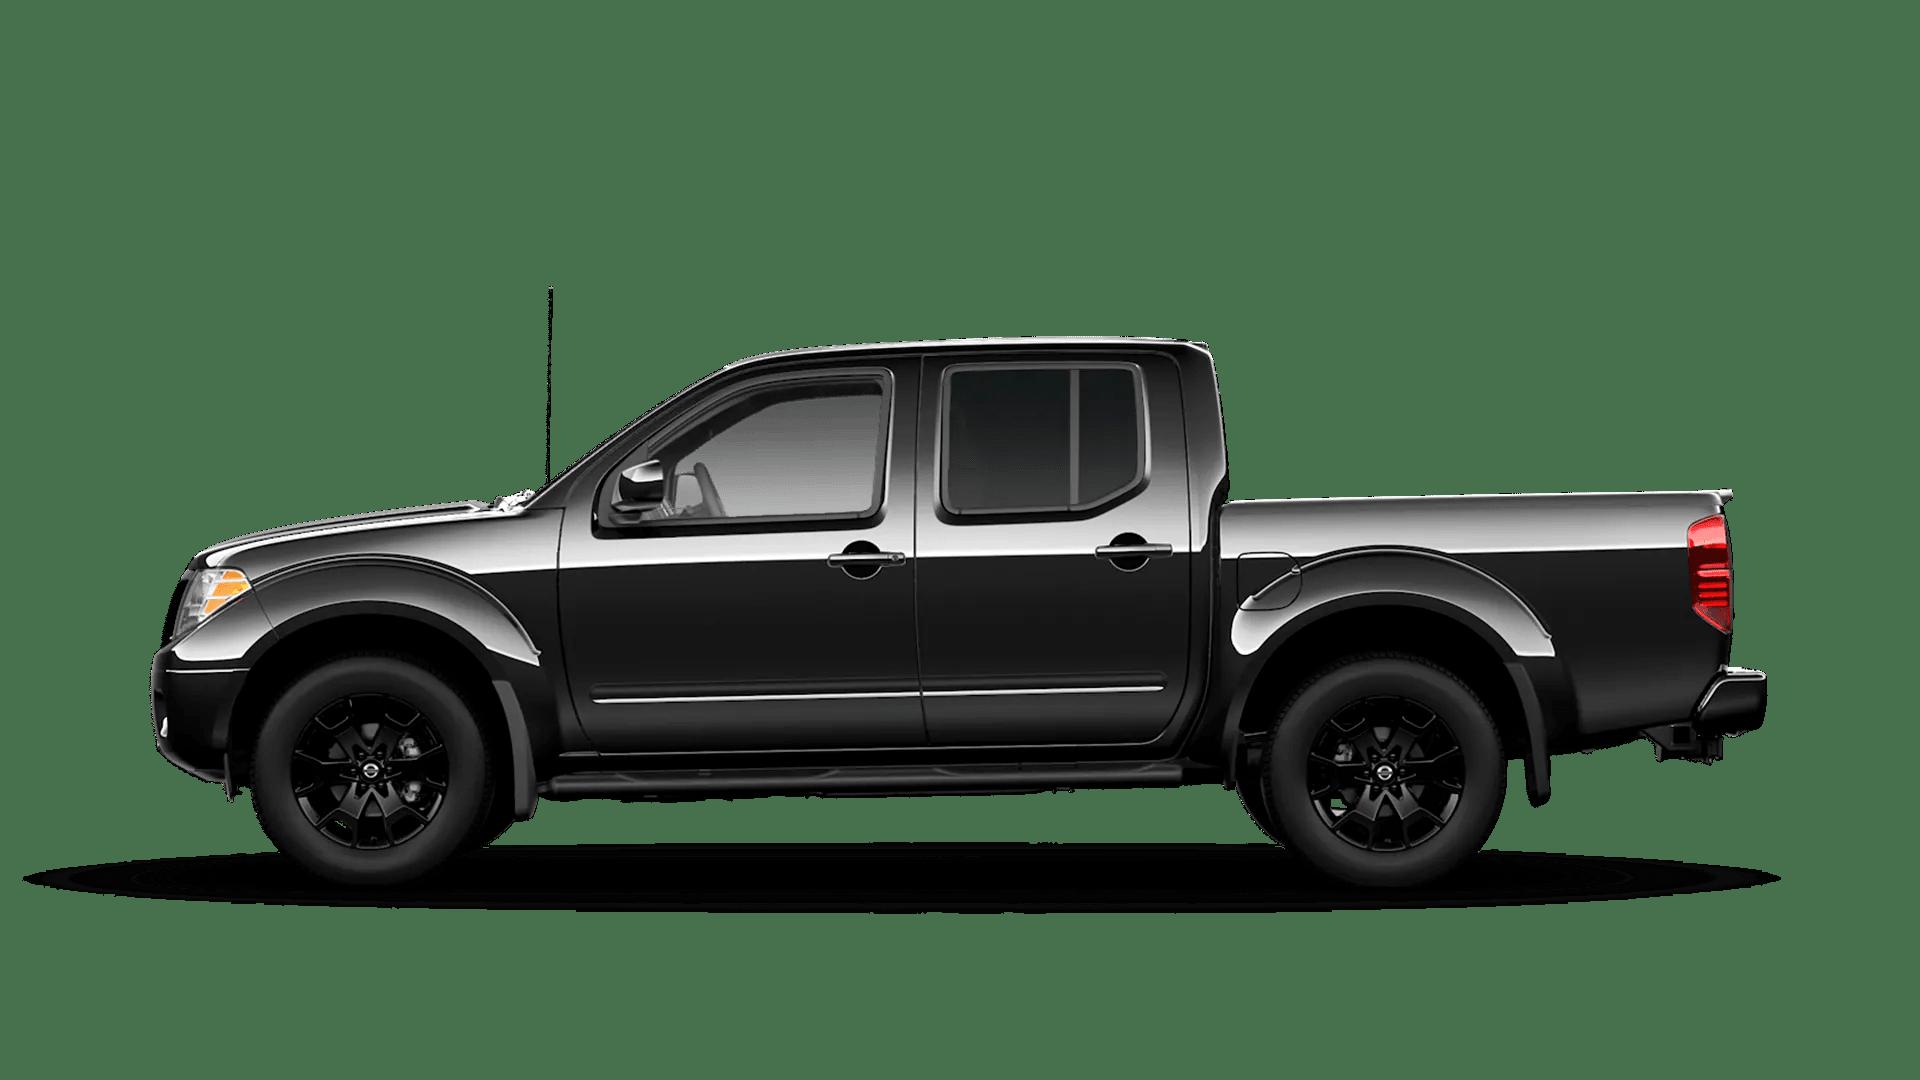 2021 Nissan Frontier Midnight Edition